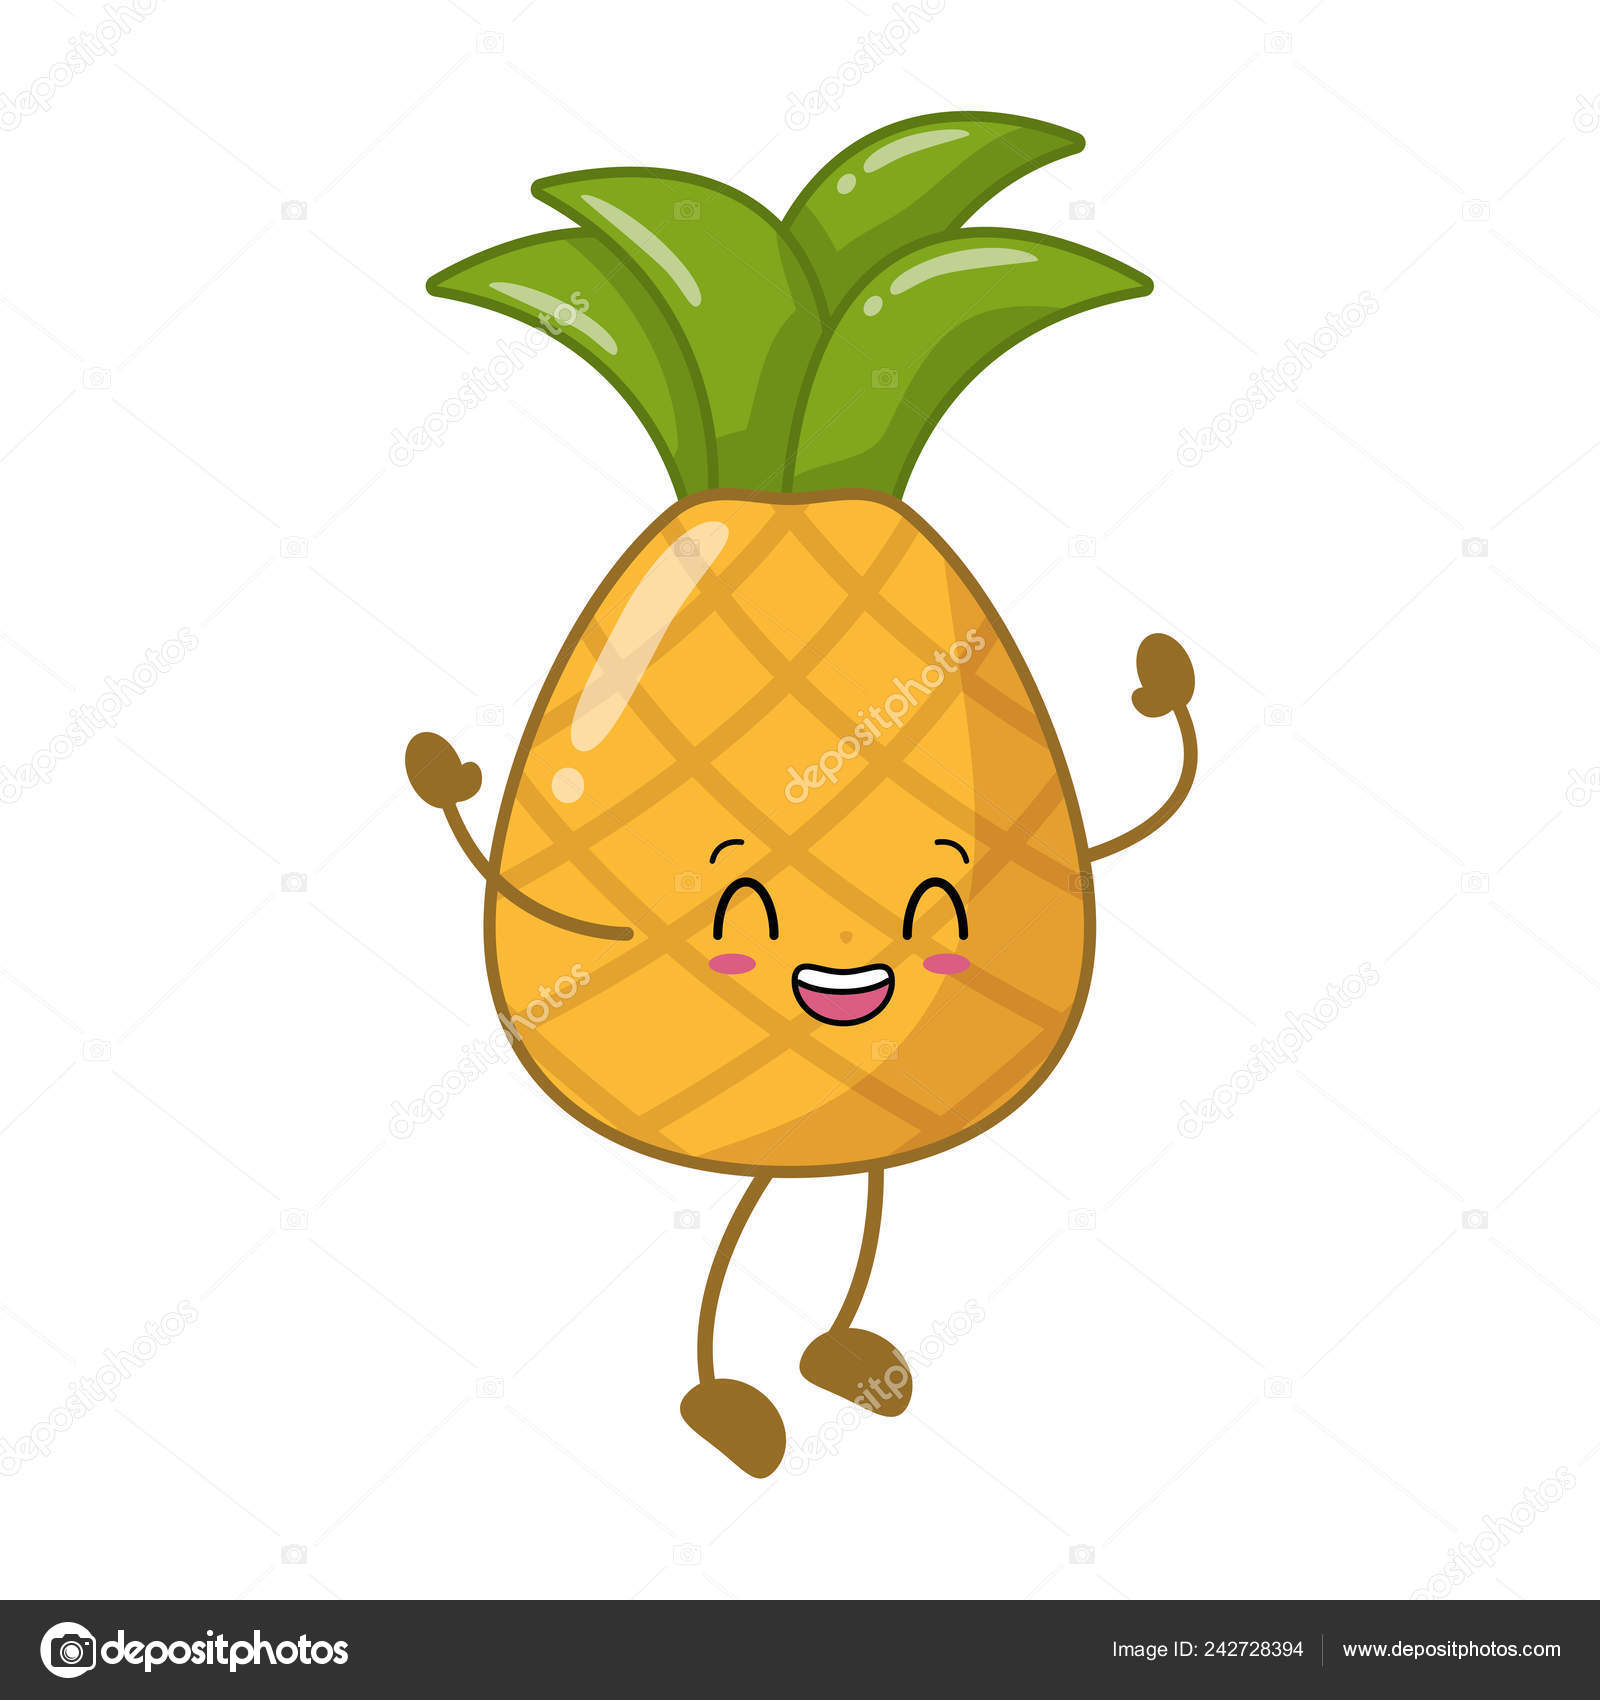 Pictures Kawaii Pineapple Kawaii Pineapple Cartoon